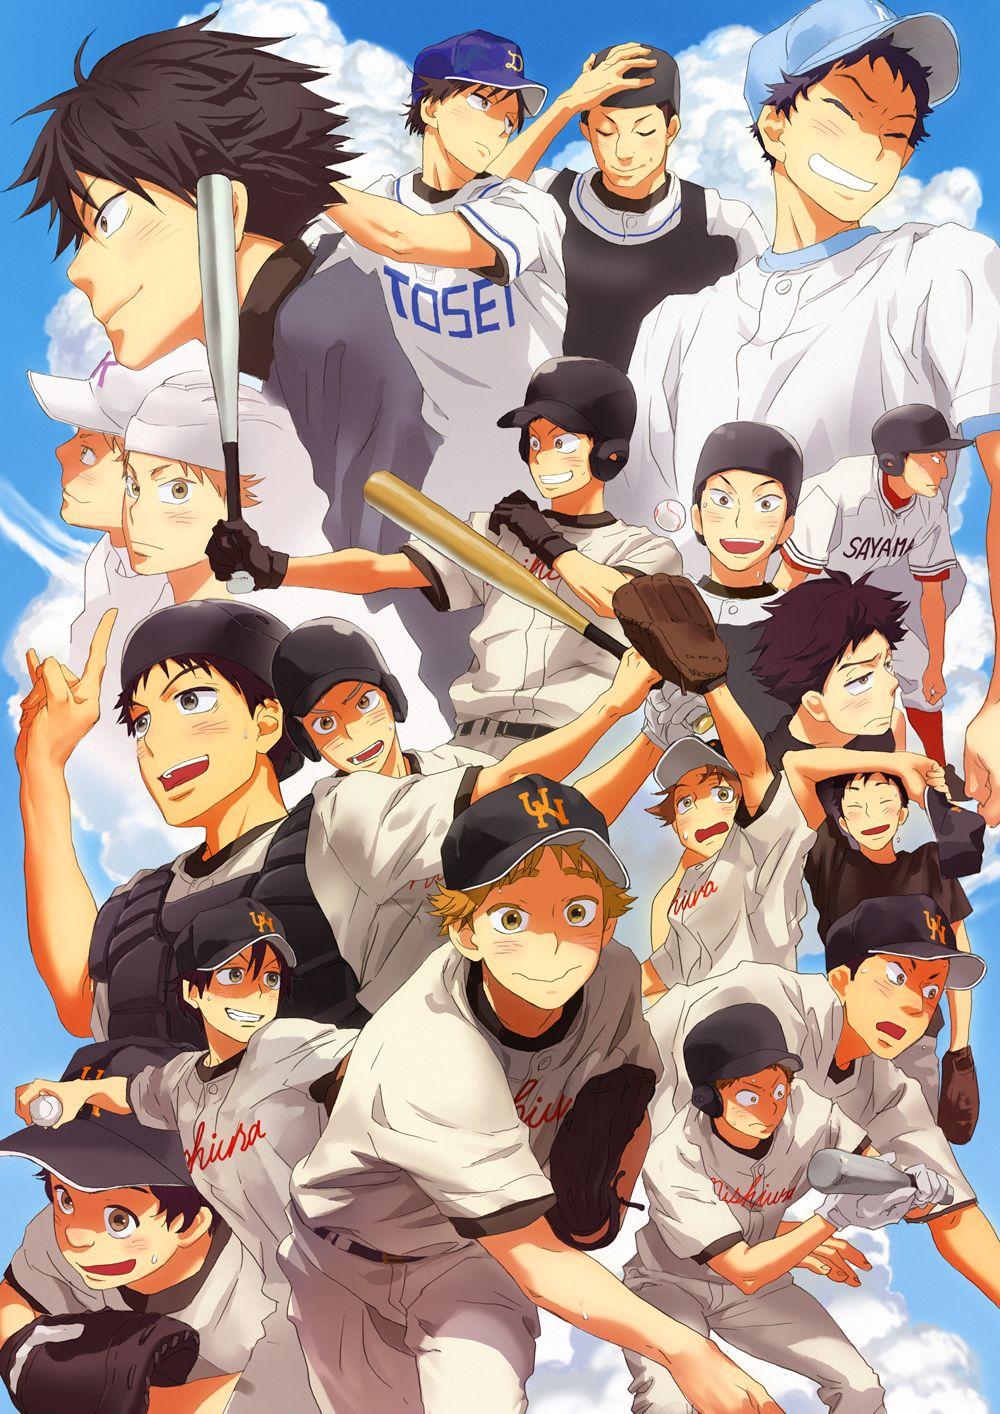 Ookiku Furikabutte Review Anime, Baseball anime, Kawaii